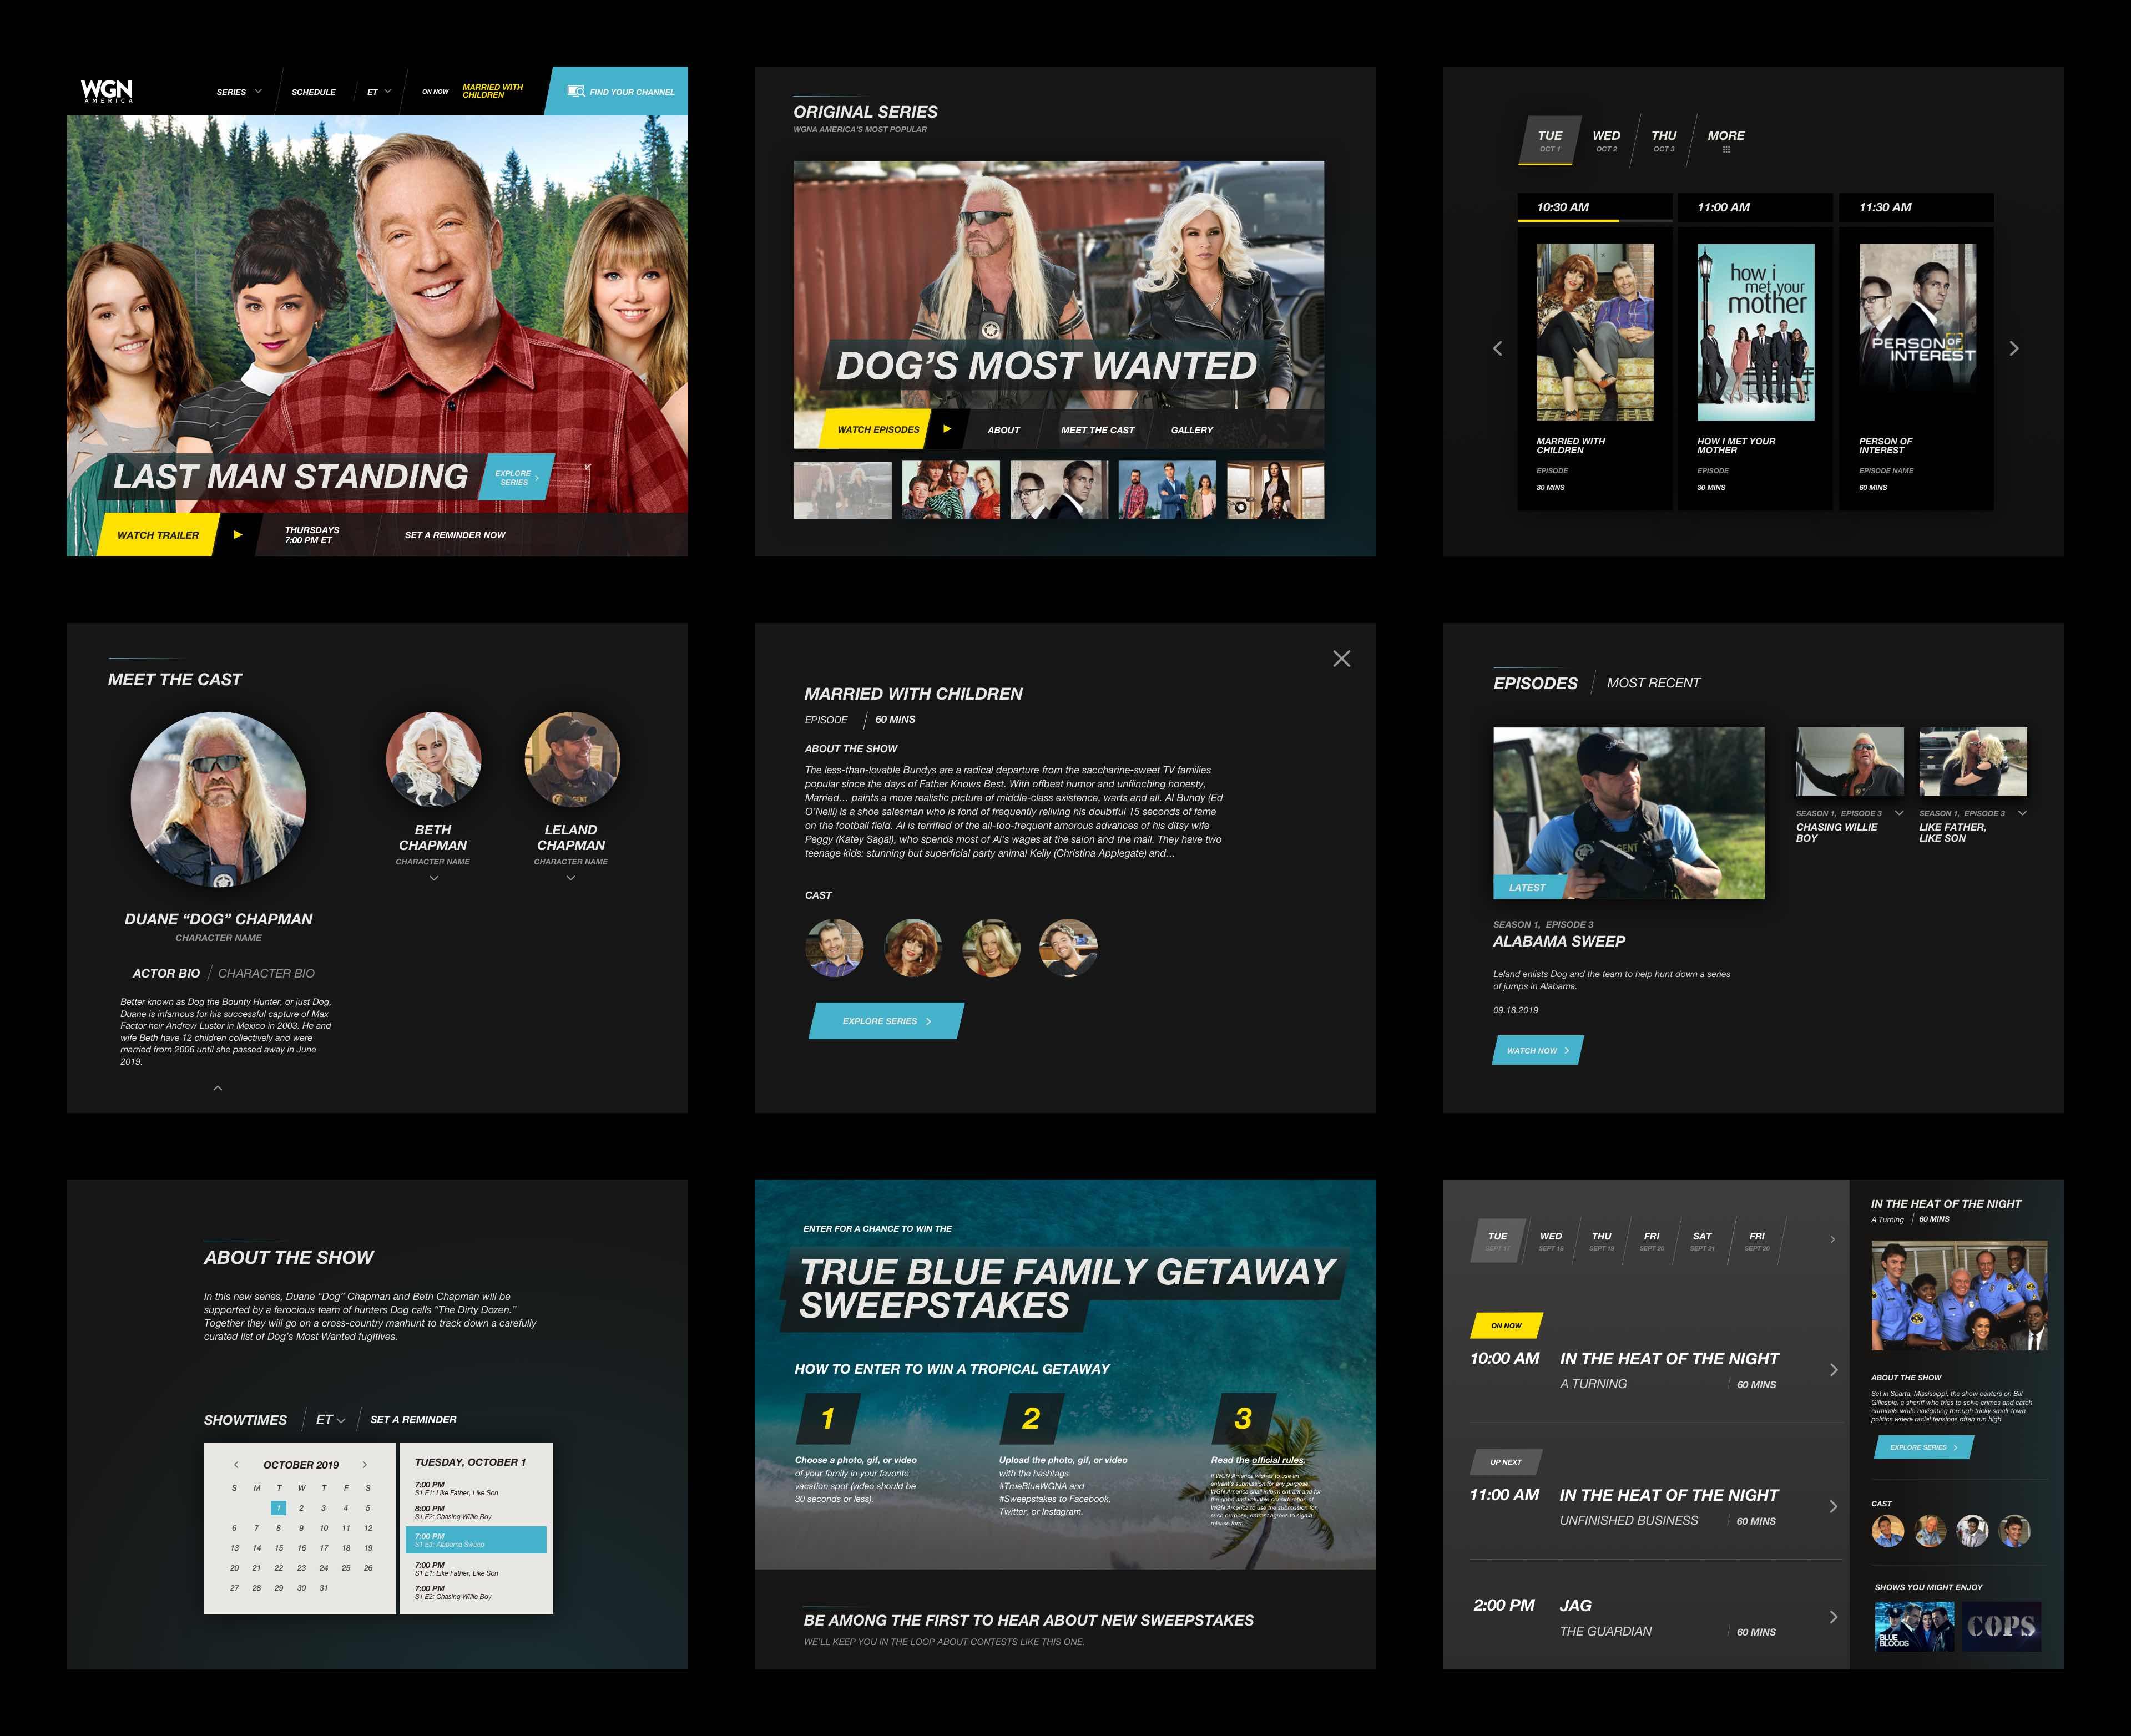 UI interface design for WGN America website